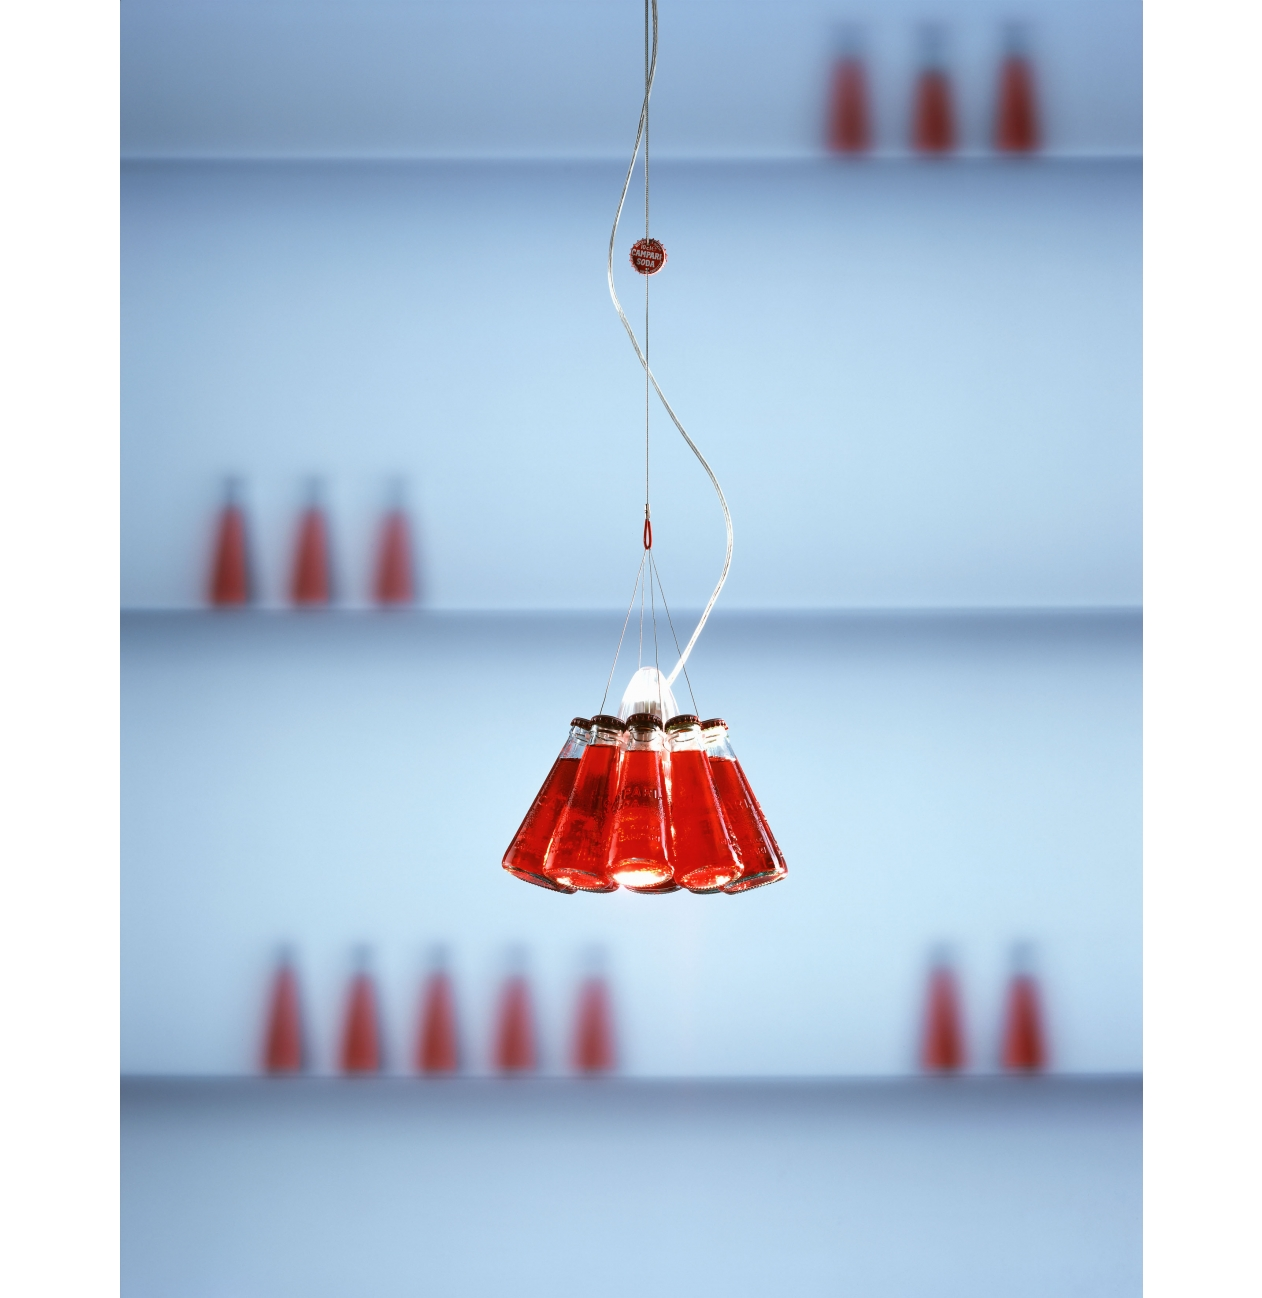 ingo maurer hanglamp campari light 155 cm versteeg lichtstudio. Black Bedroom Furniture Sets. Home Design Ideas